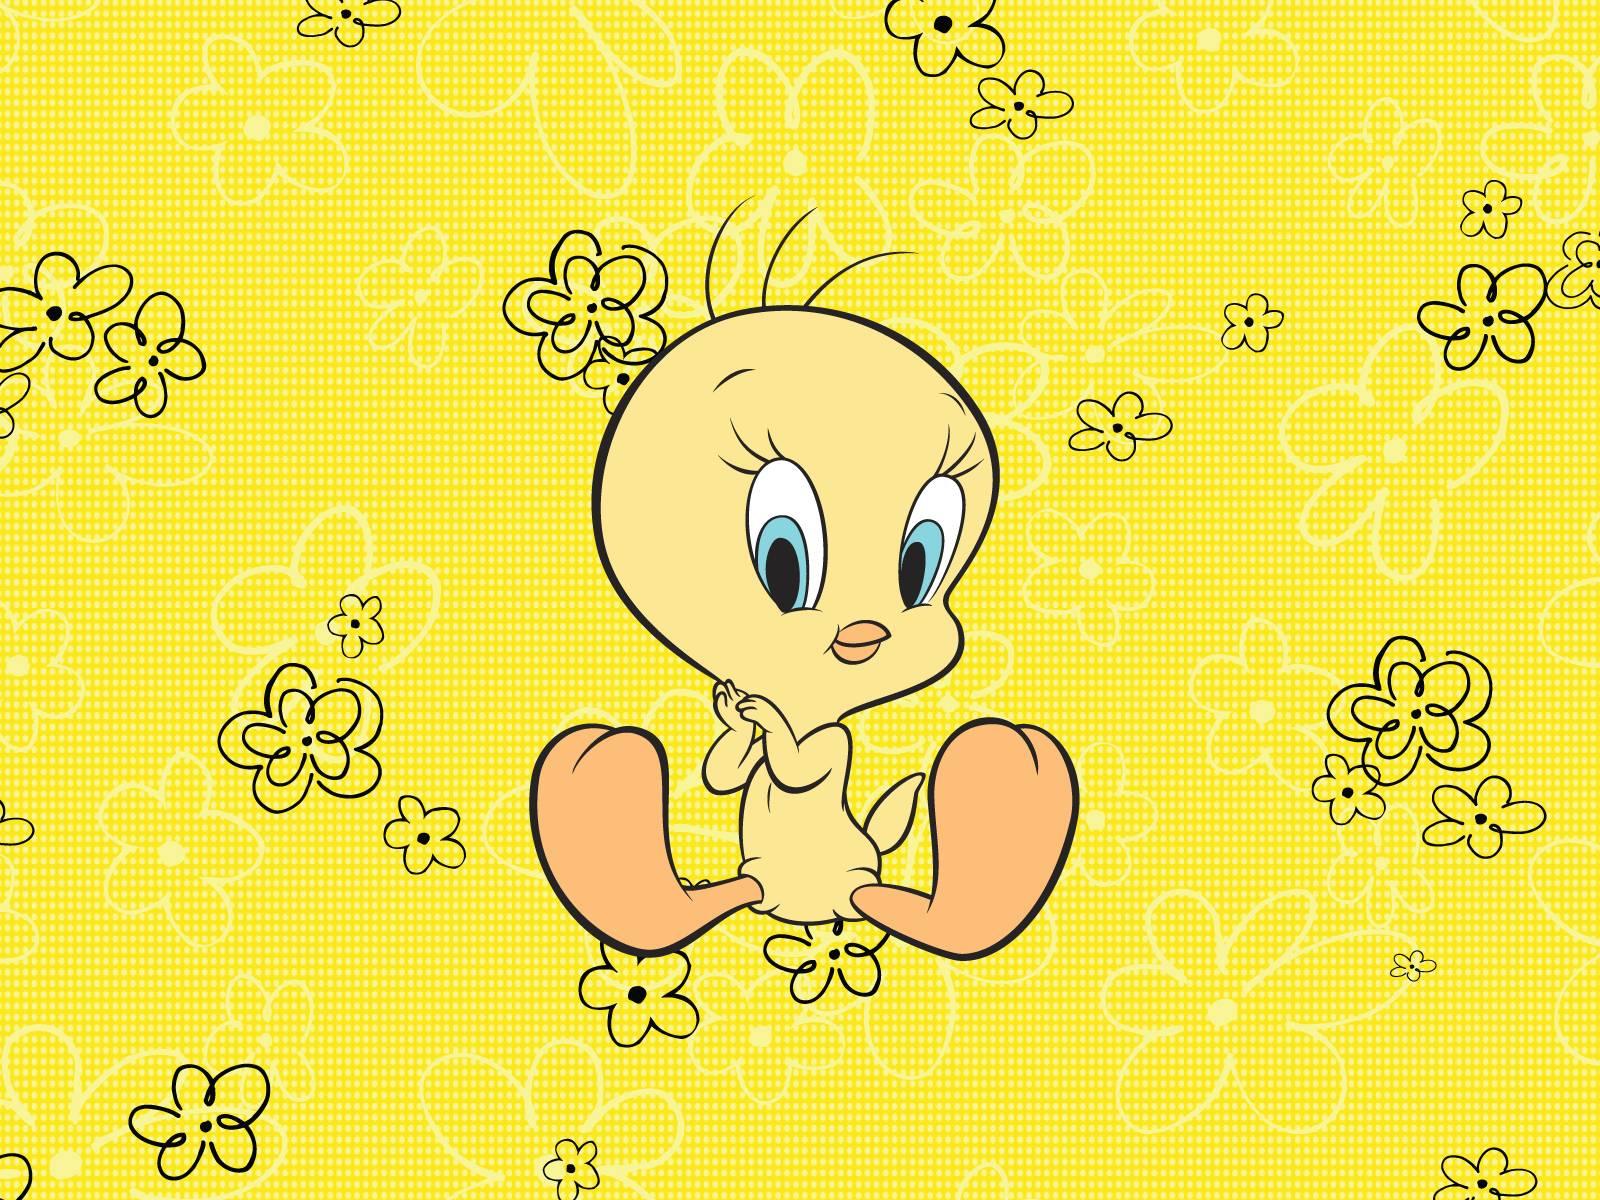 Baby looney tunes wallpaper tweety